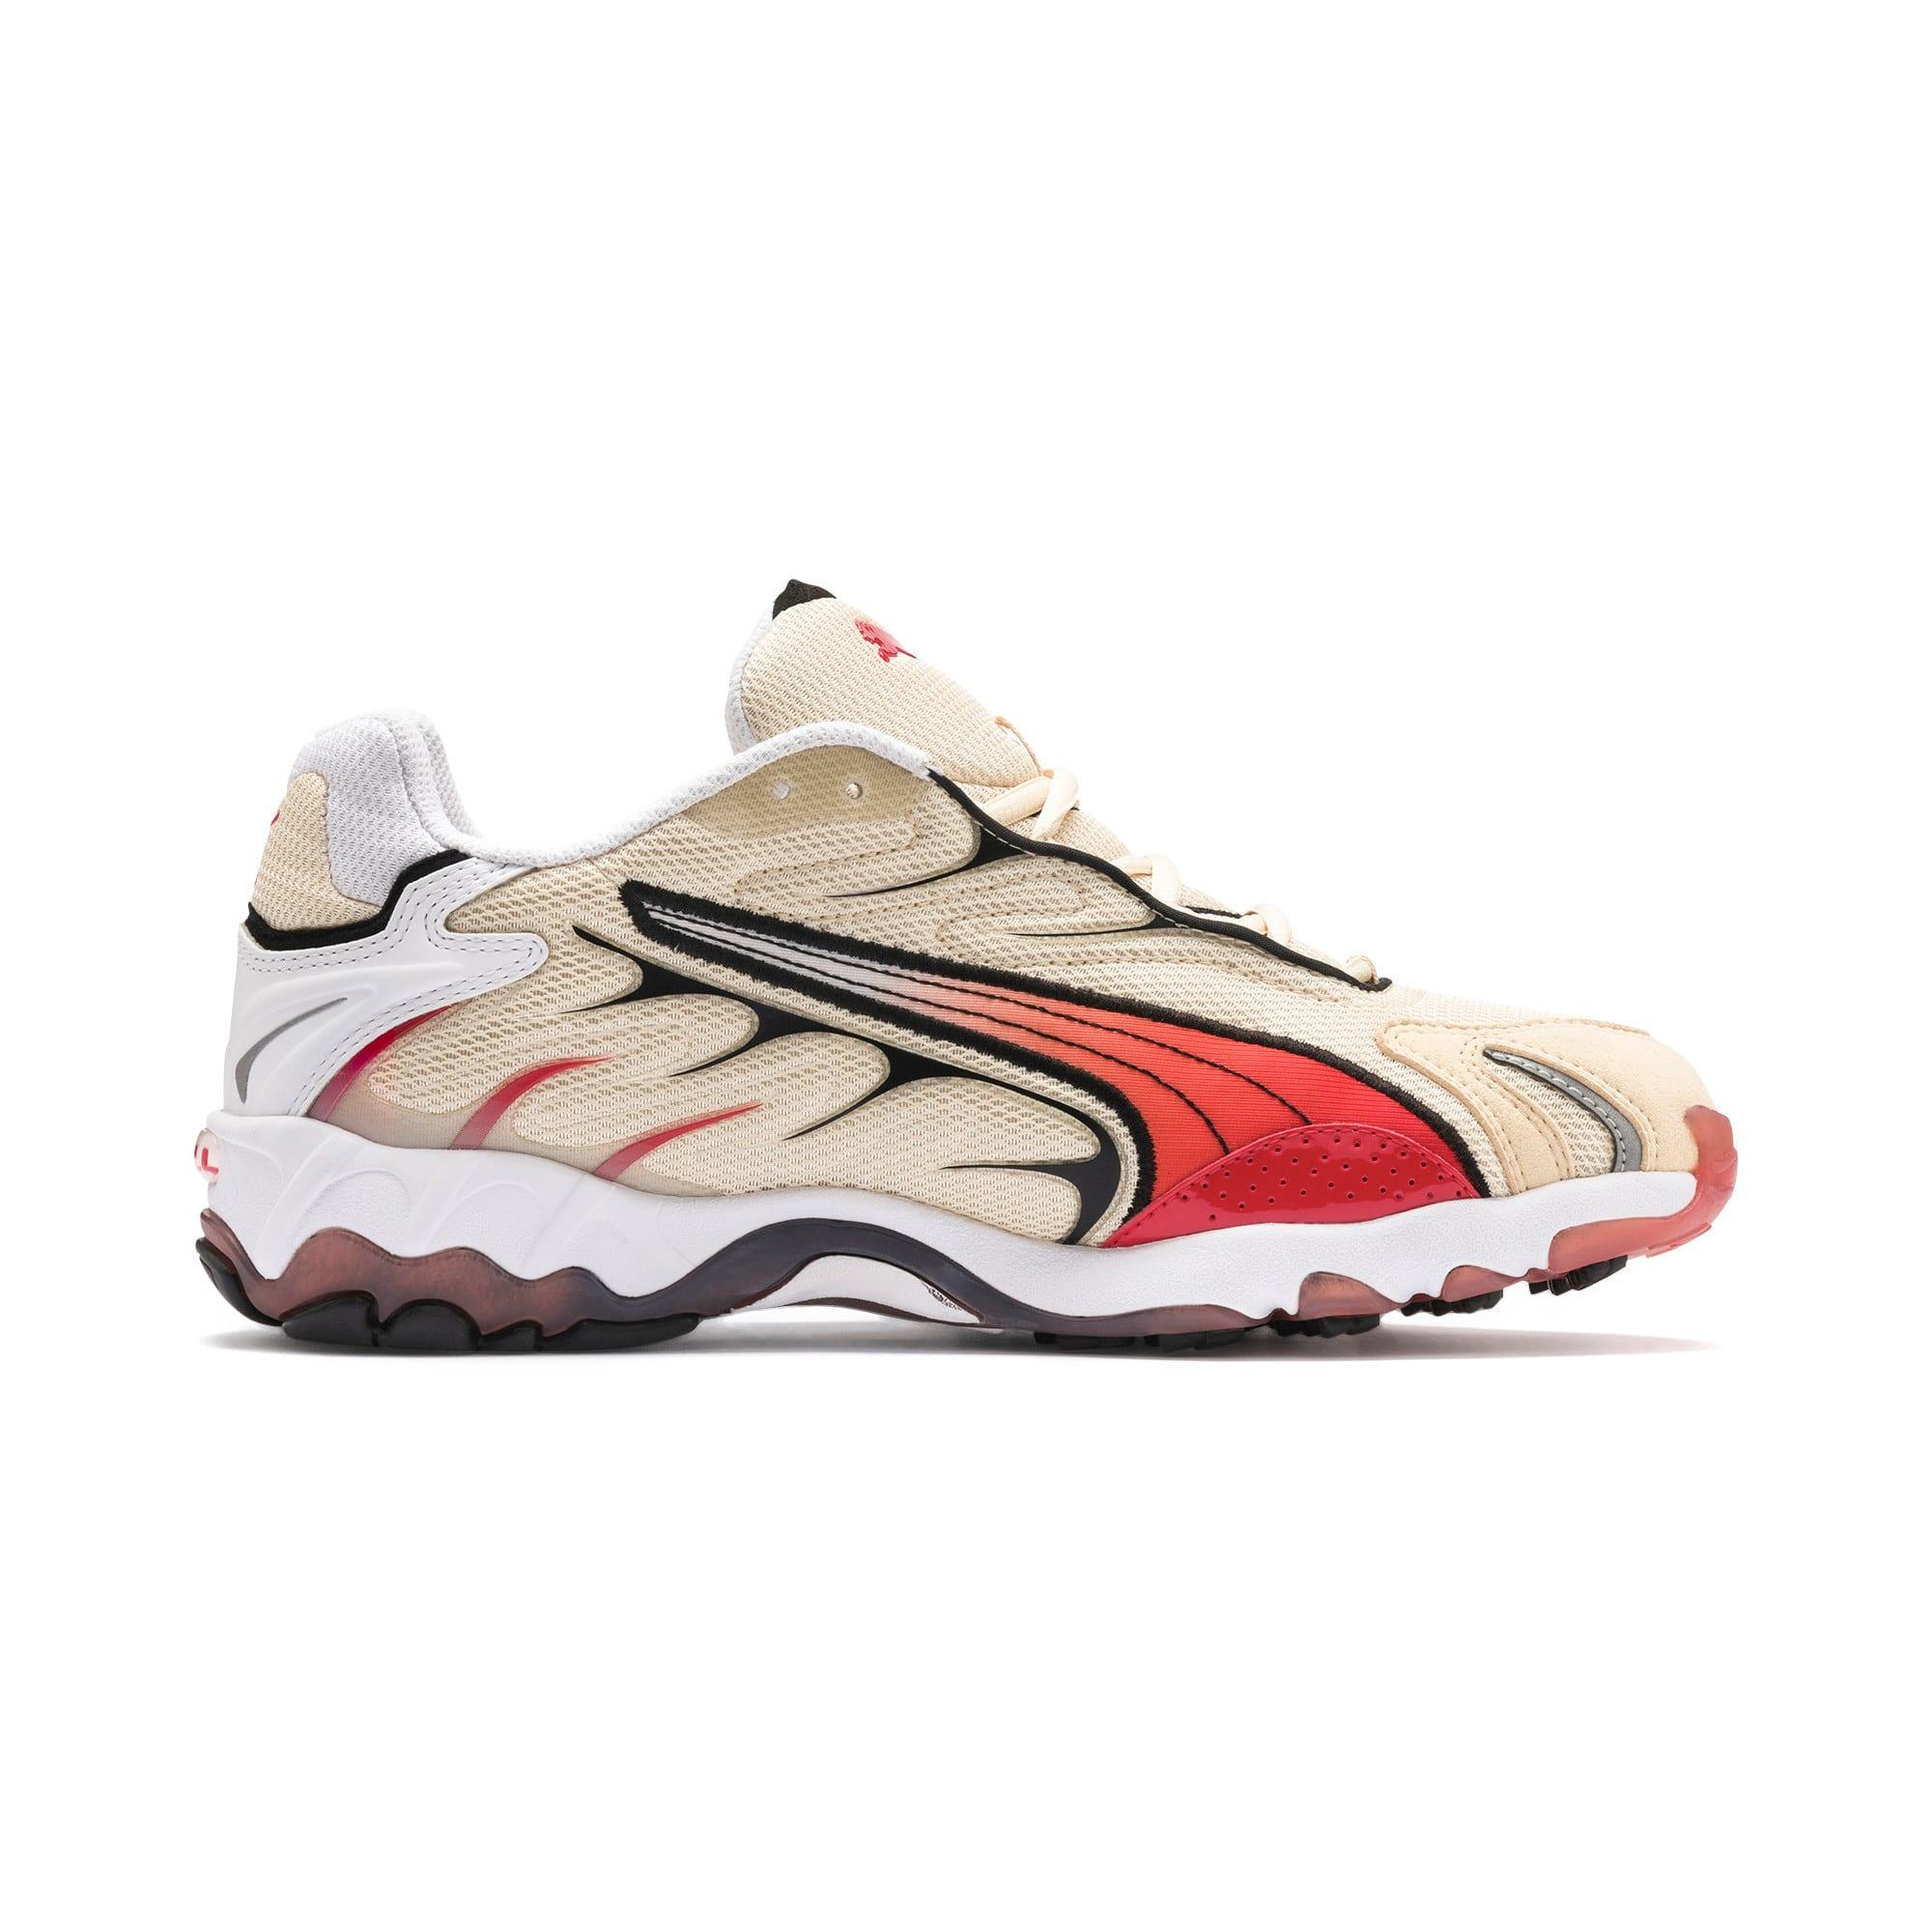 Thumbnail 6 of Inhale Sneakers, Summer Melon-High Risk Red, medium